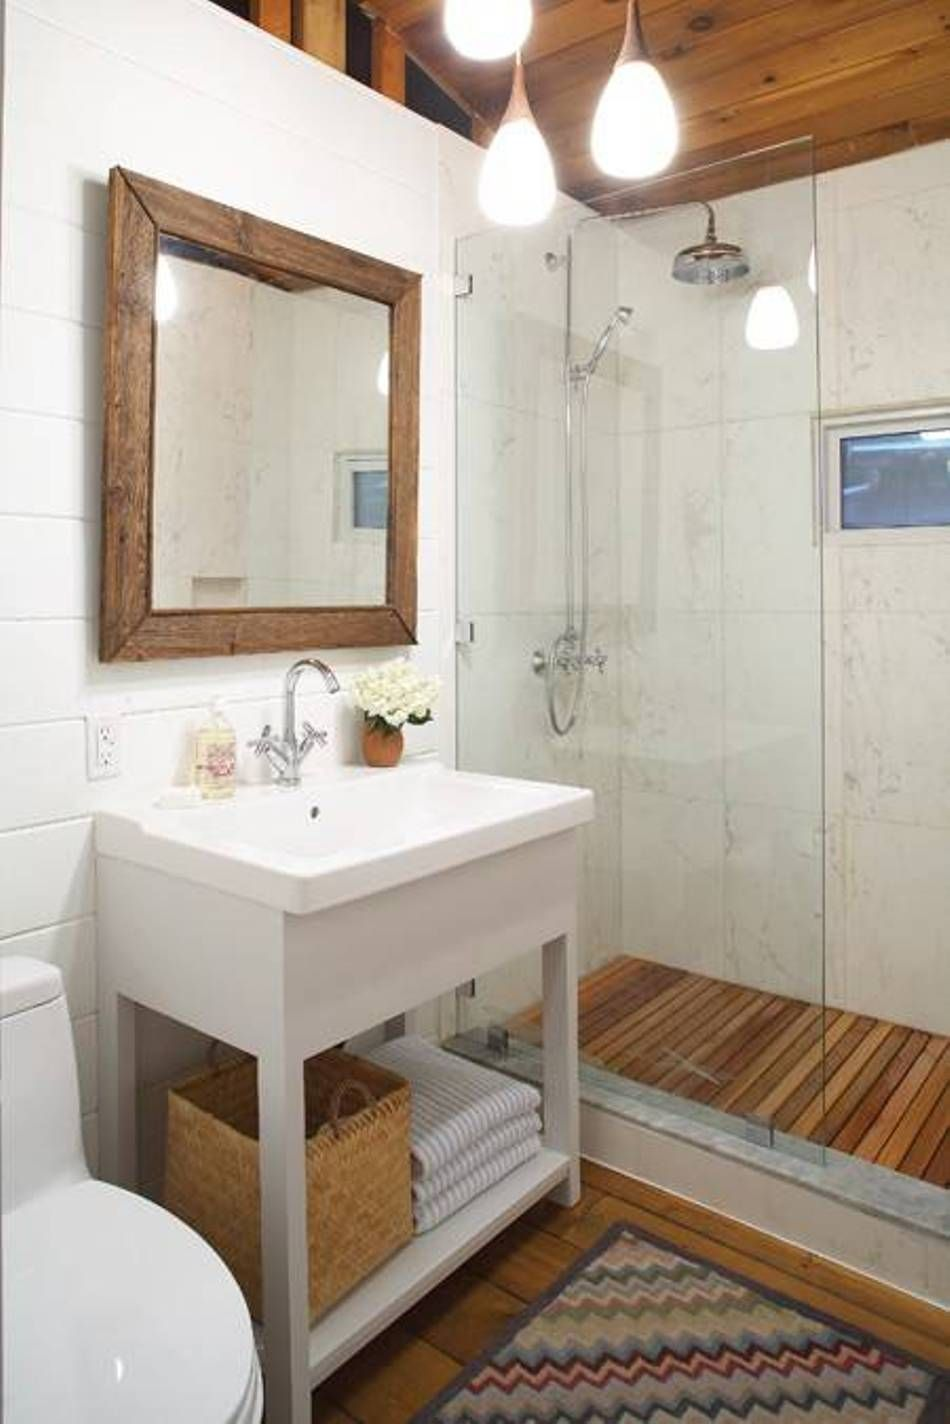 Modern bathroom pendant lighting - 25 Scandinavian Bathroom Design Ideas